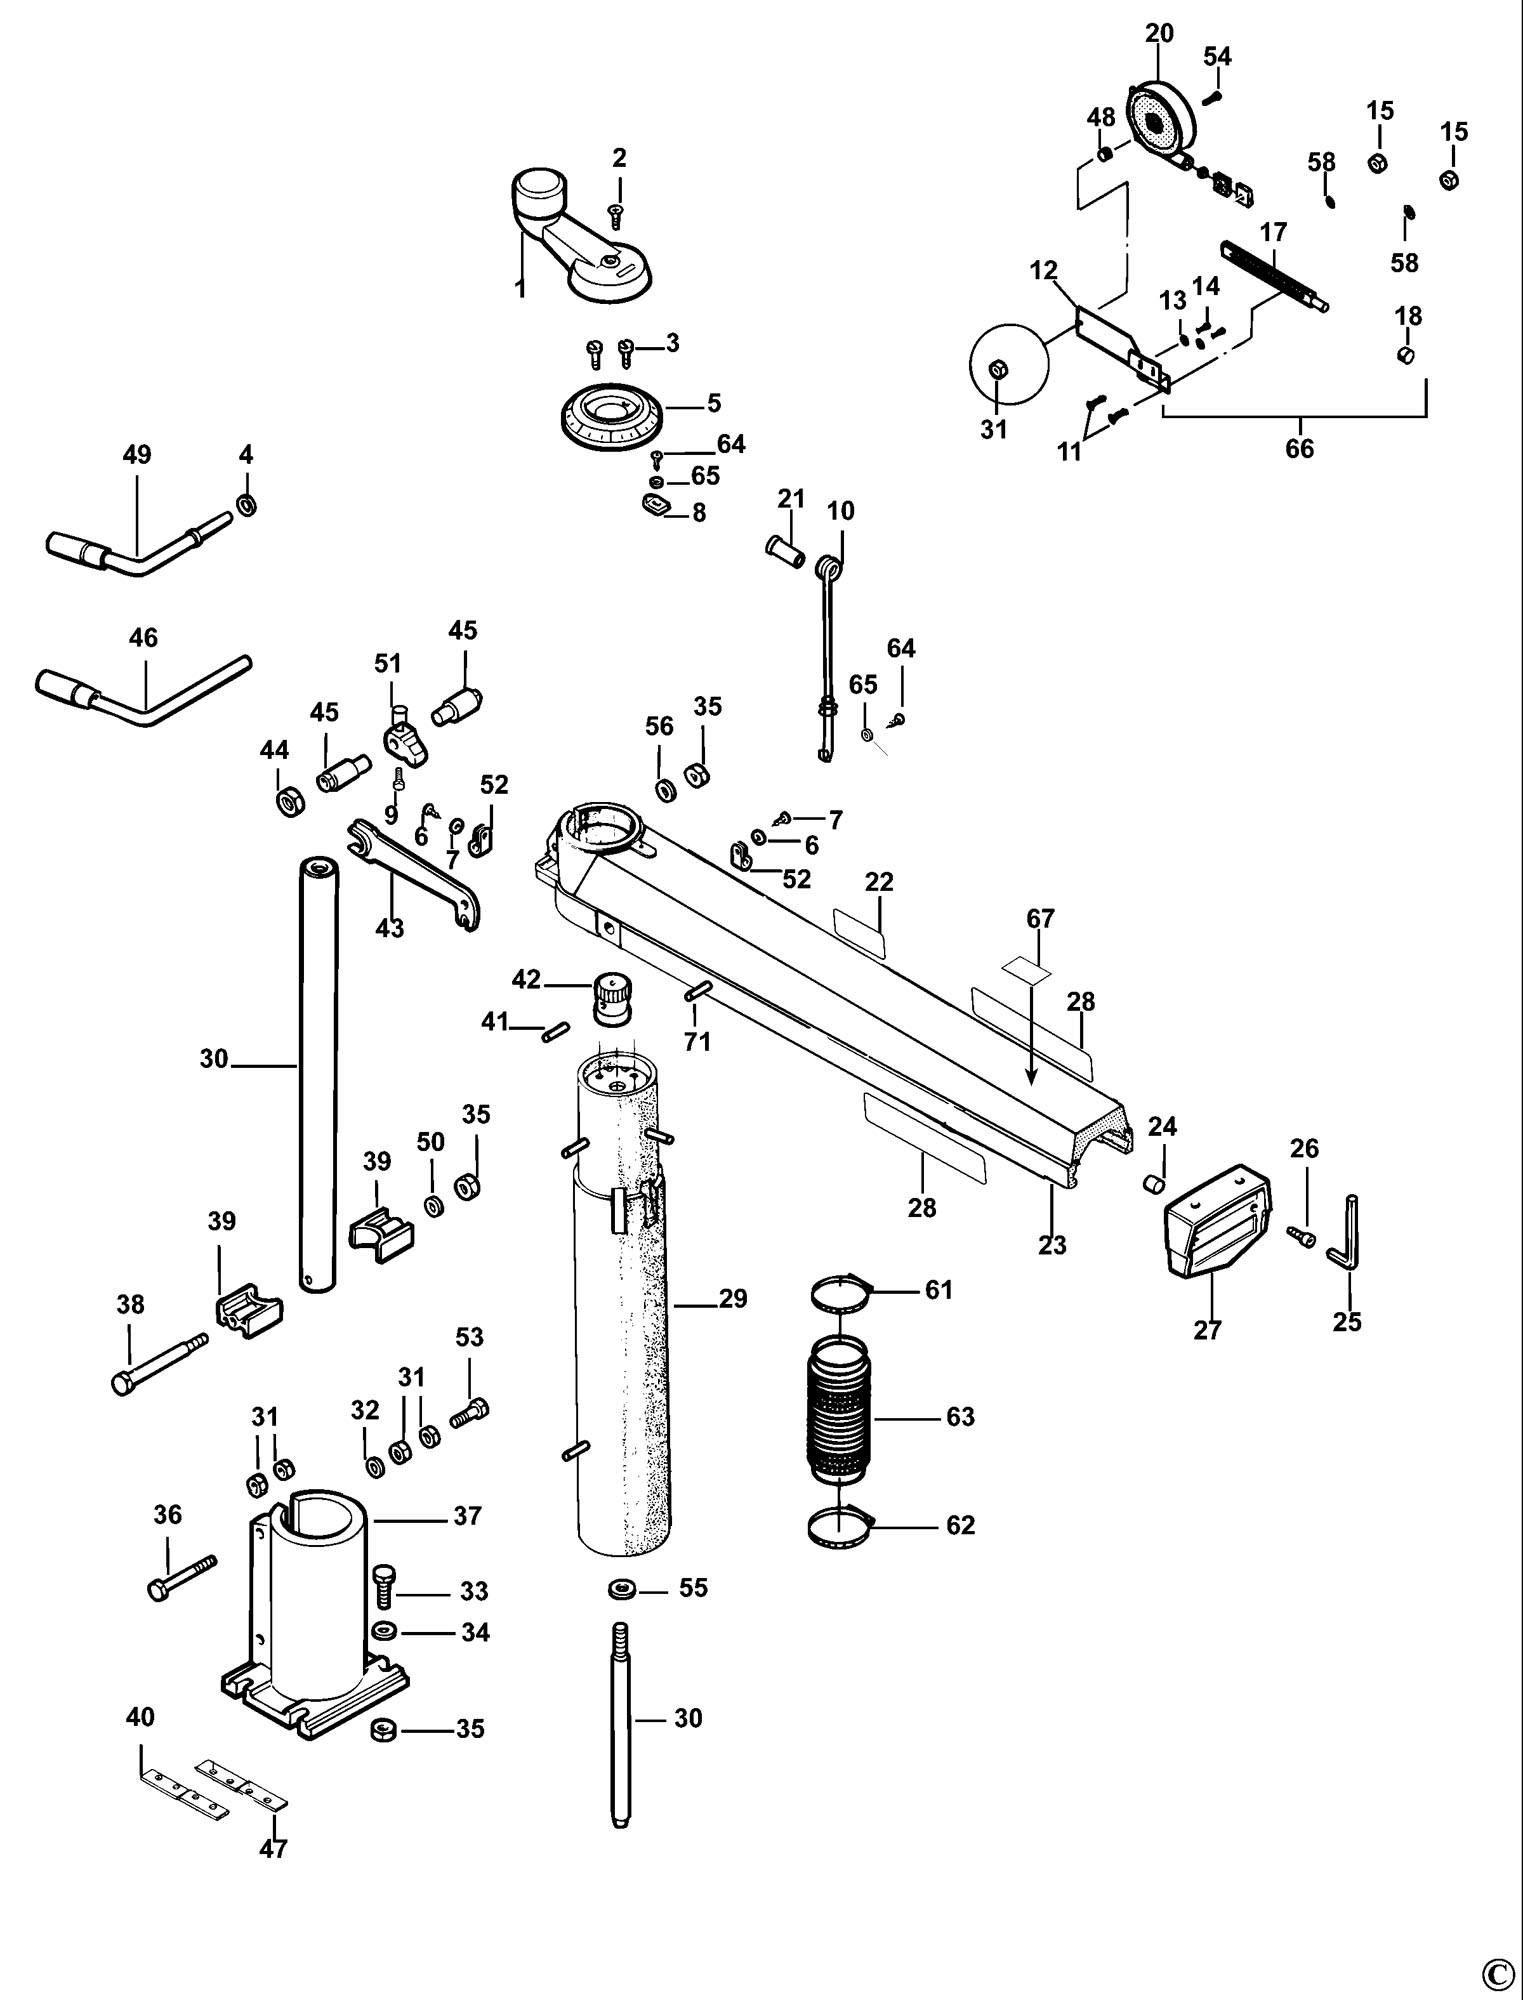 Spares For Dewalt Dw721kn Radial Arm Saw Type 2 Spare